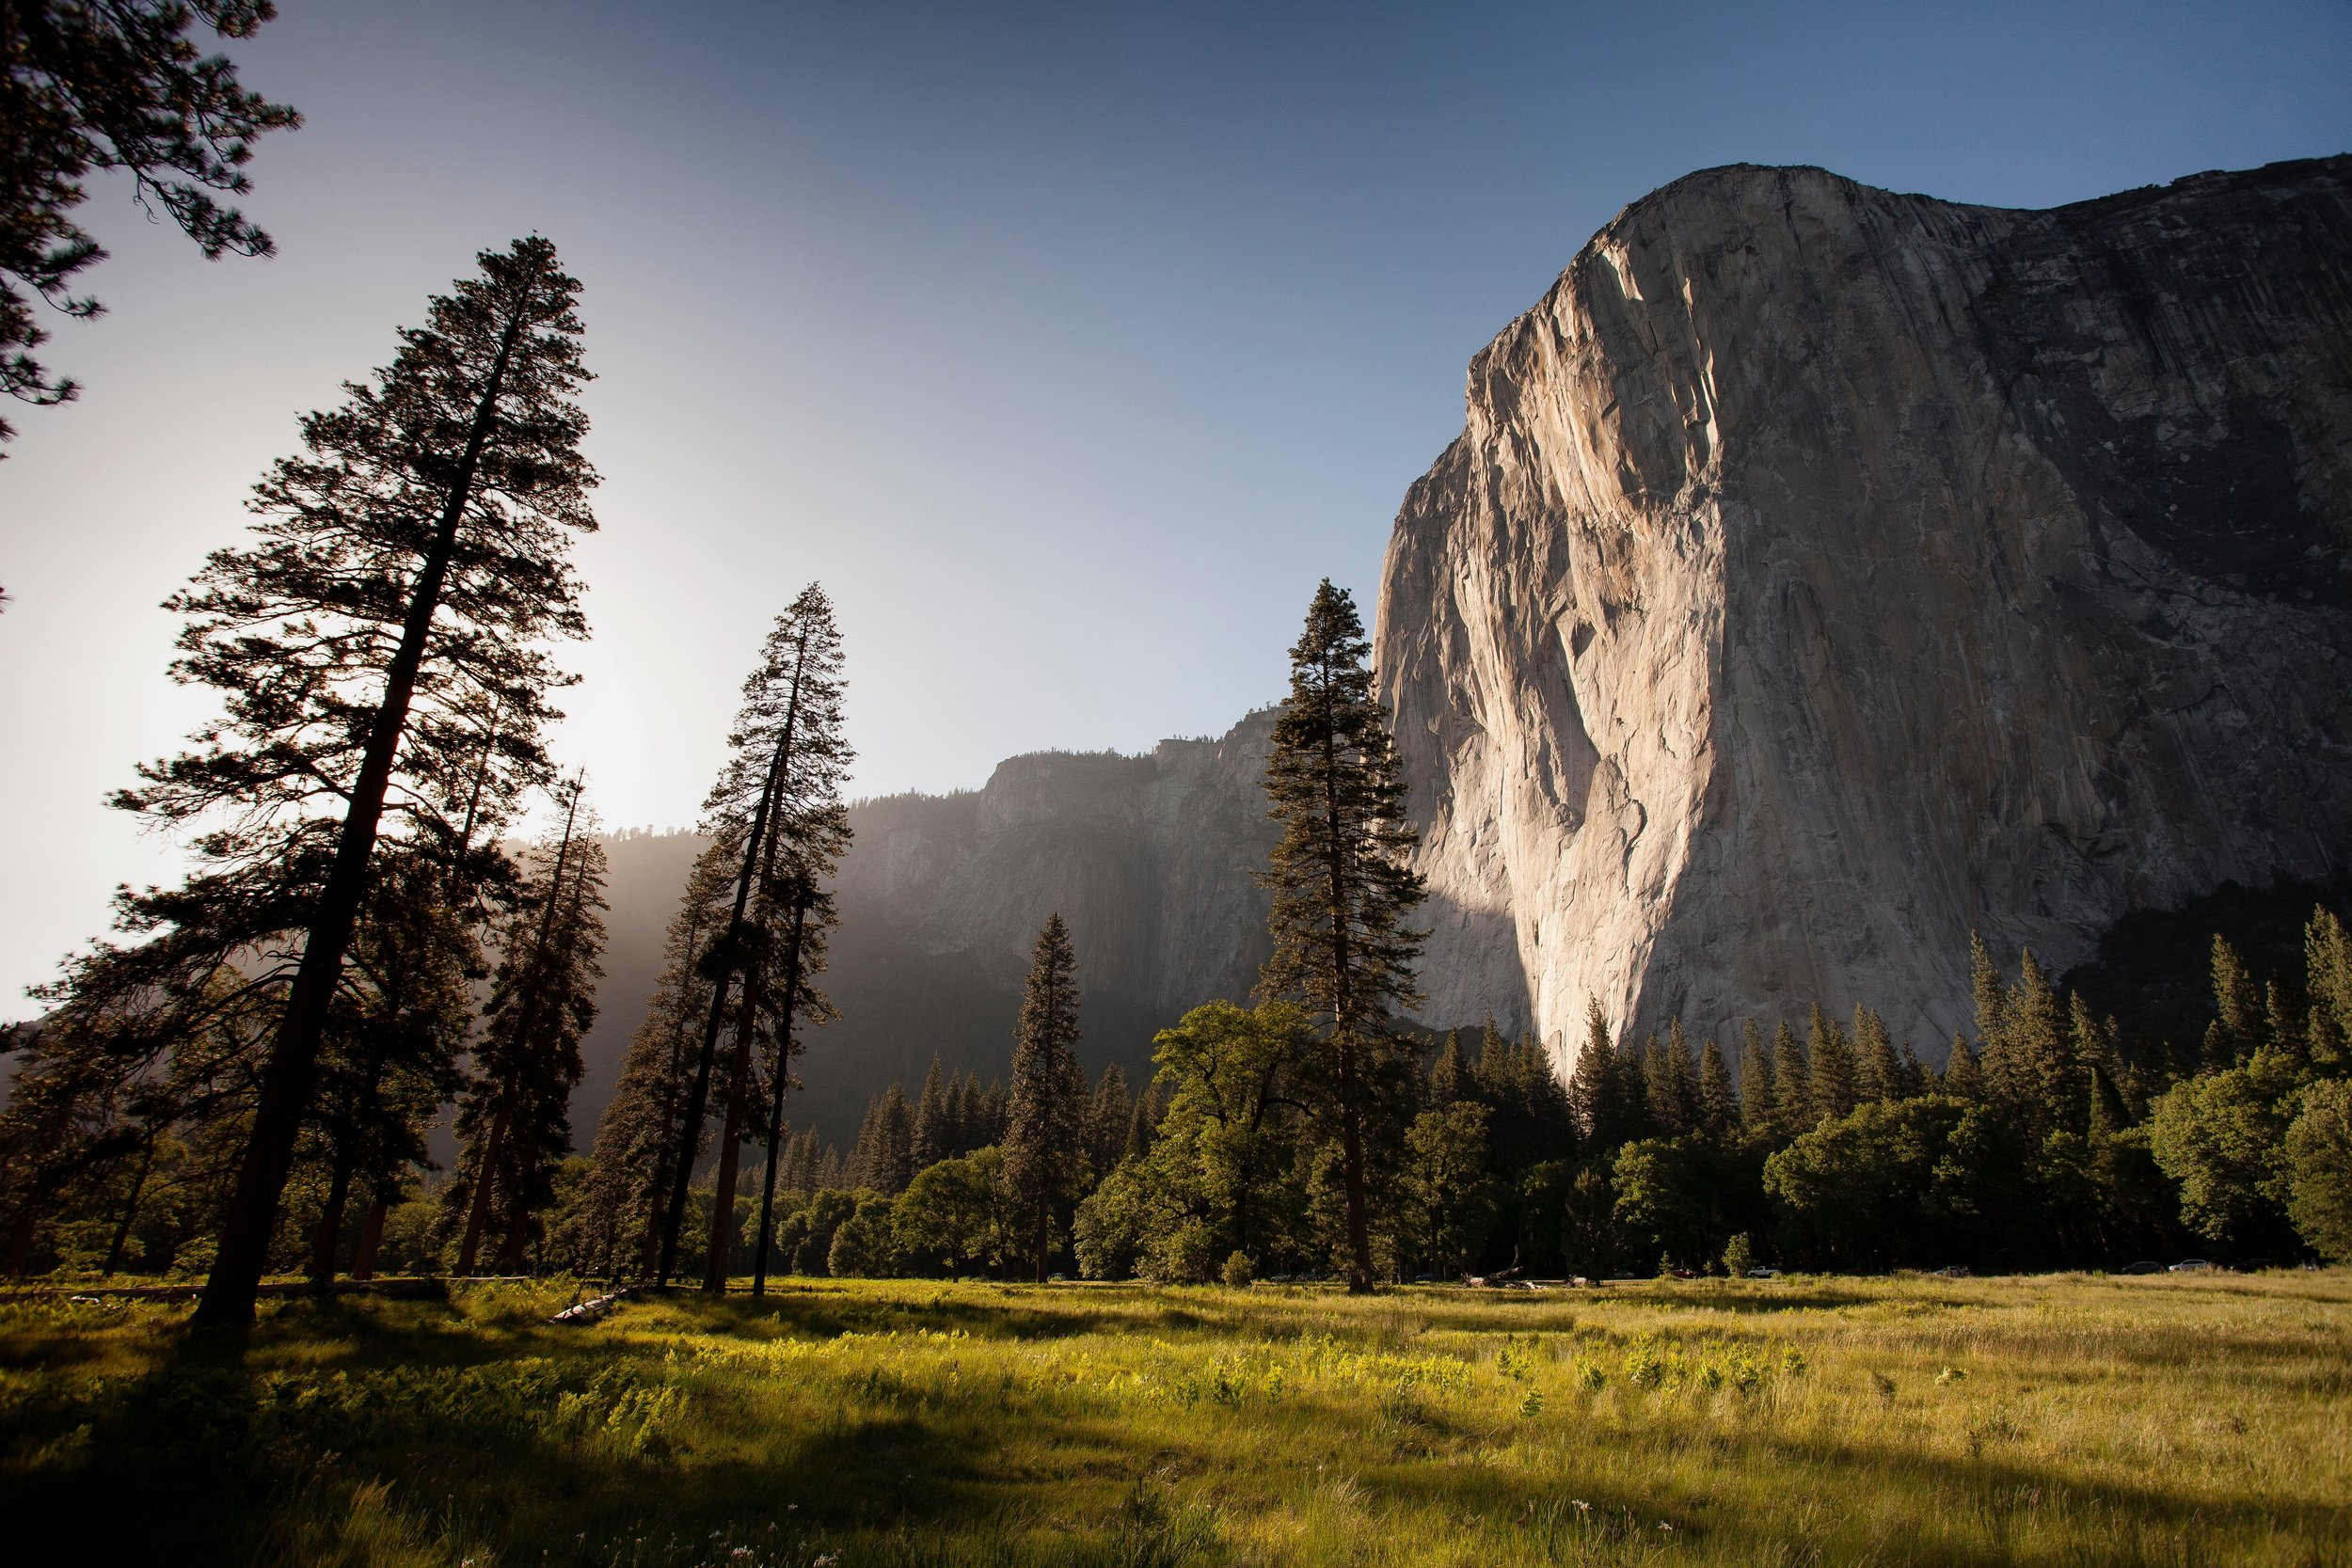 El Capitan, Yosemite National Park, U.S.